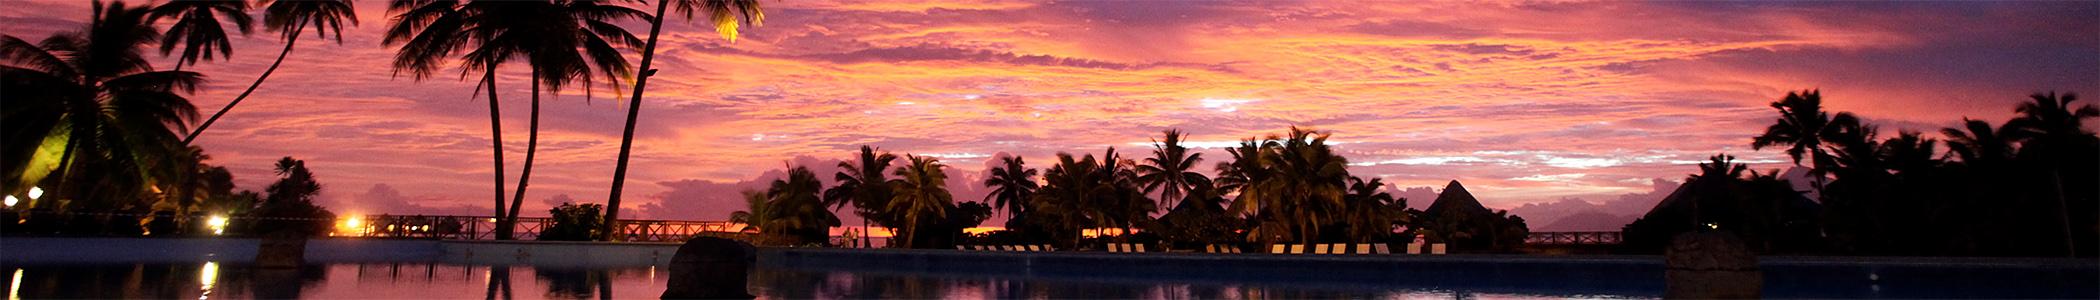 FileTahiti sunset bannerjpg  Wikimedia Commons